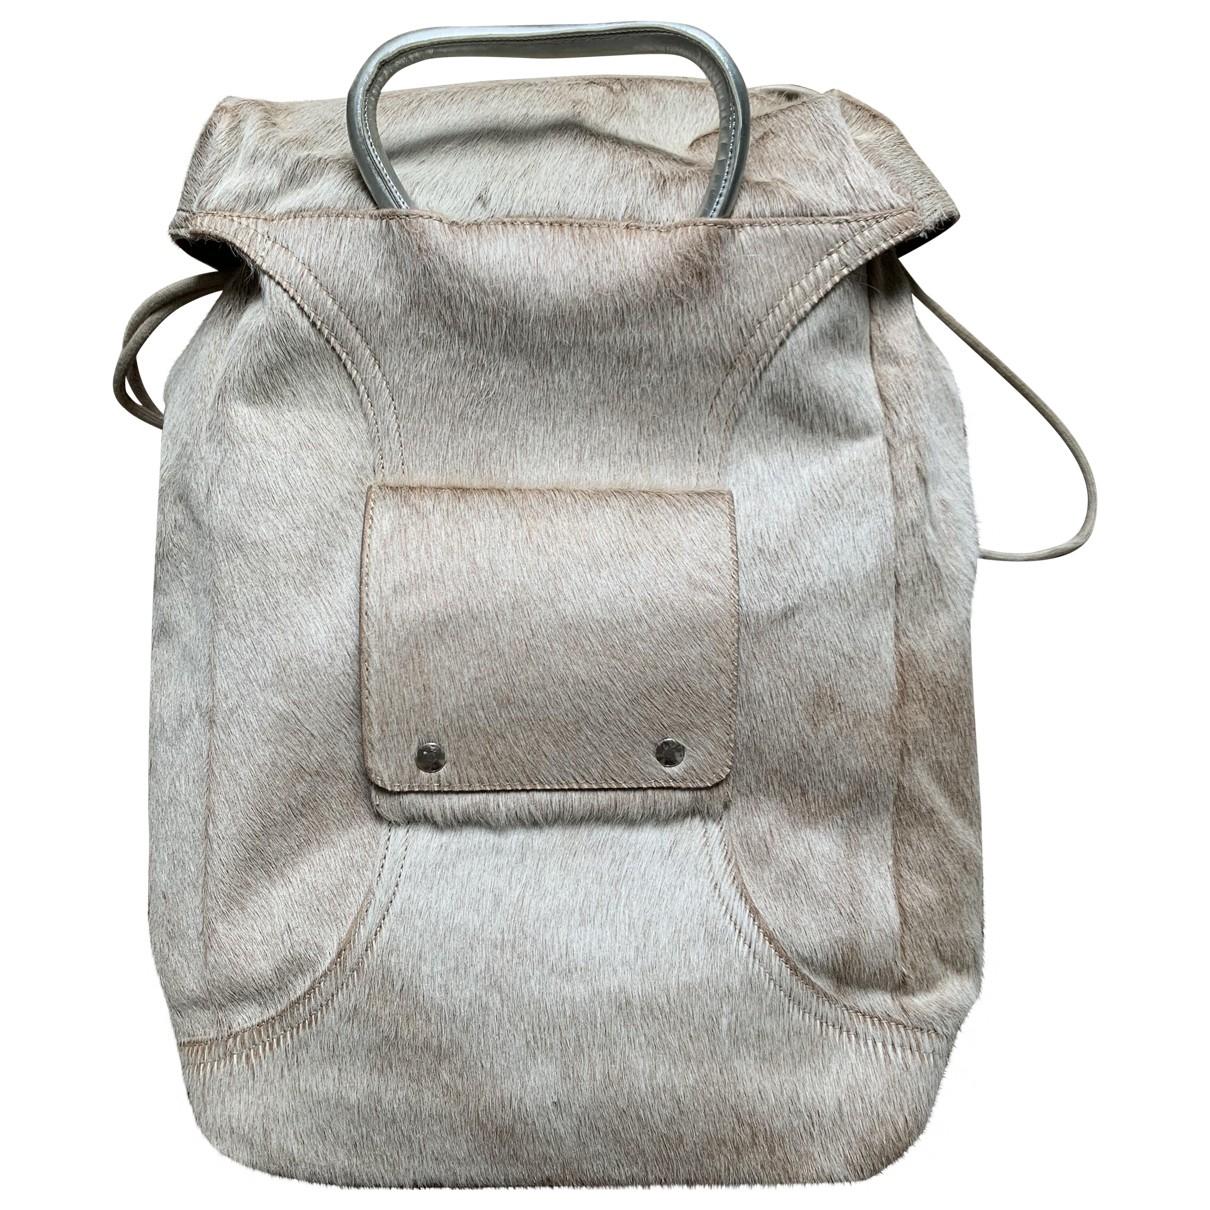 Maison Martin Margiela \N Beige Leather bag for Men \N